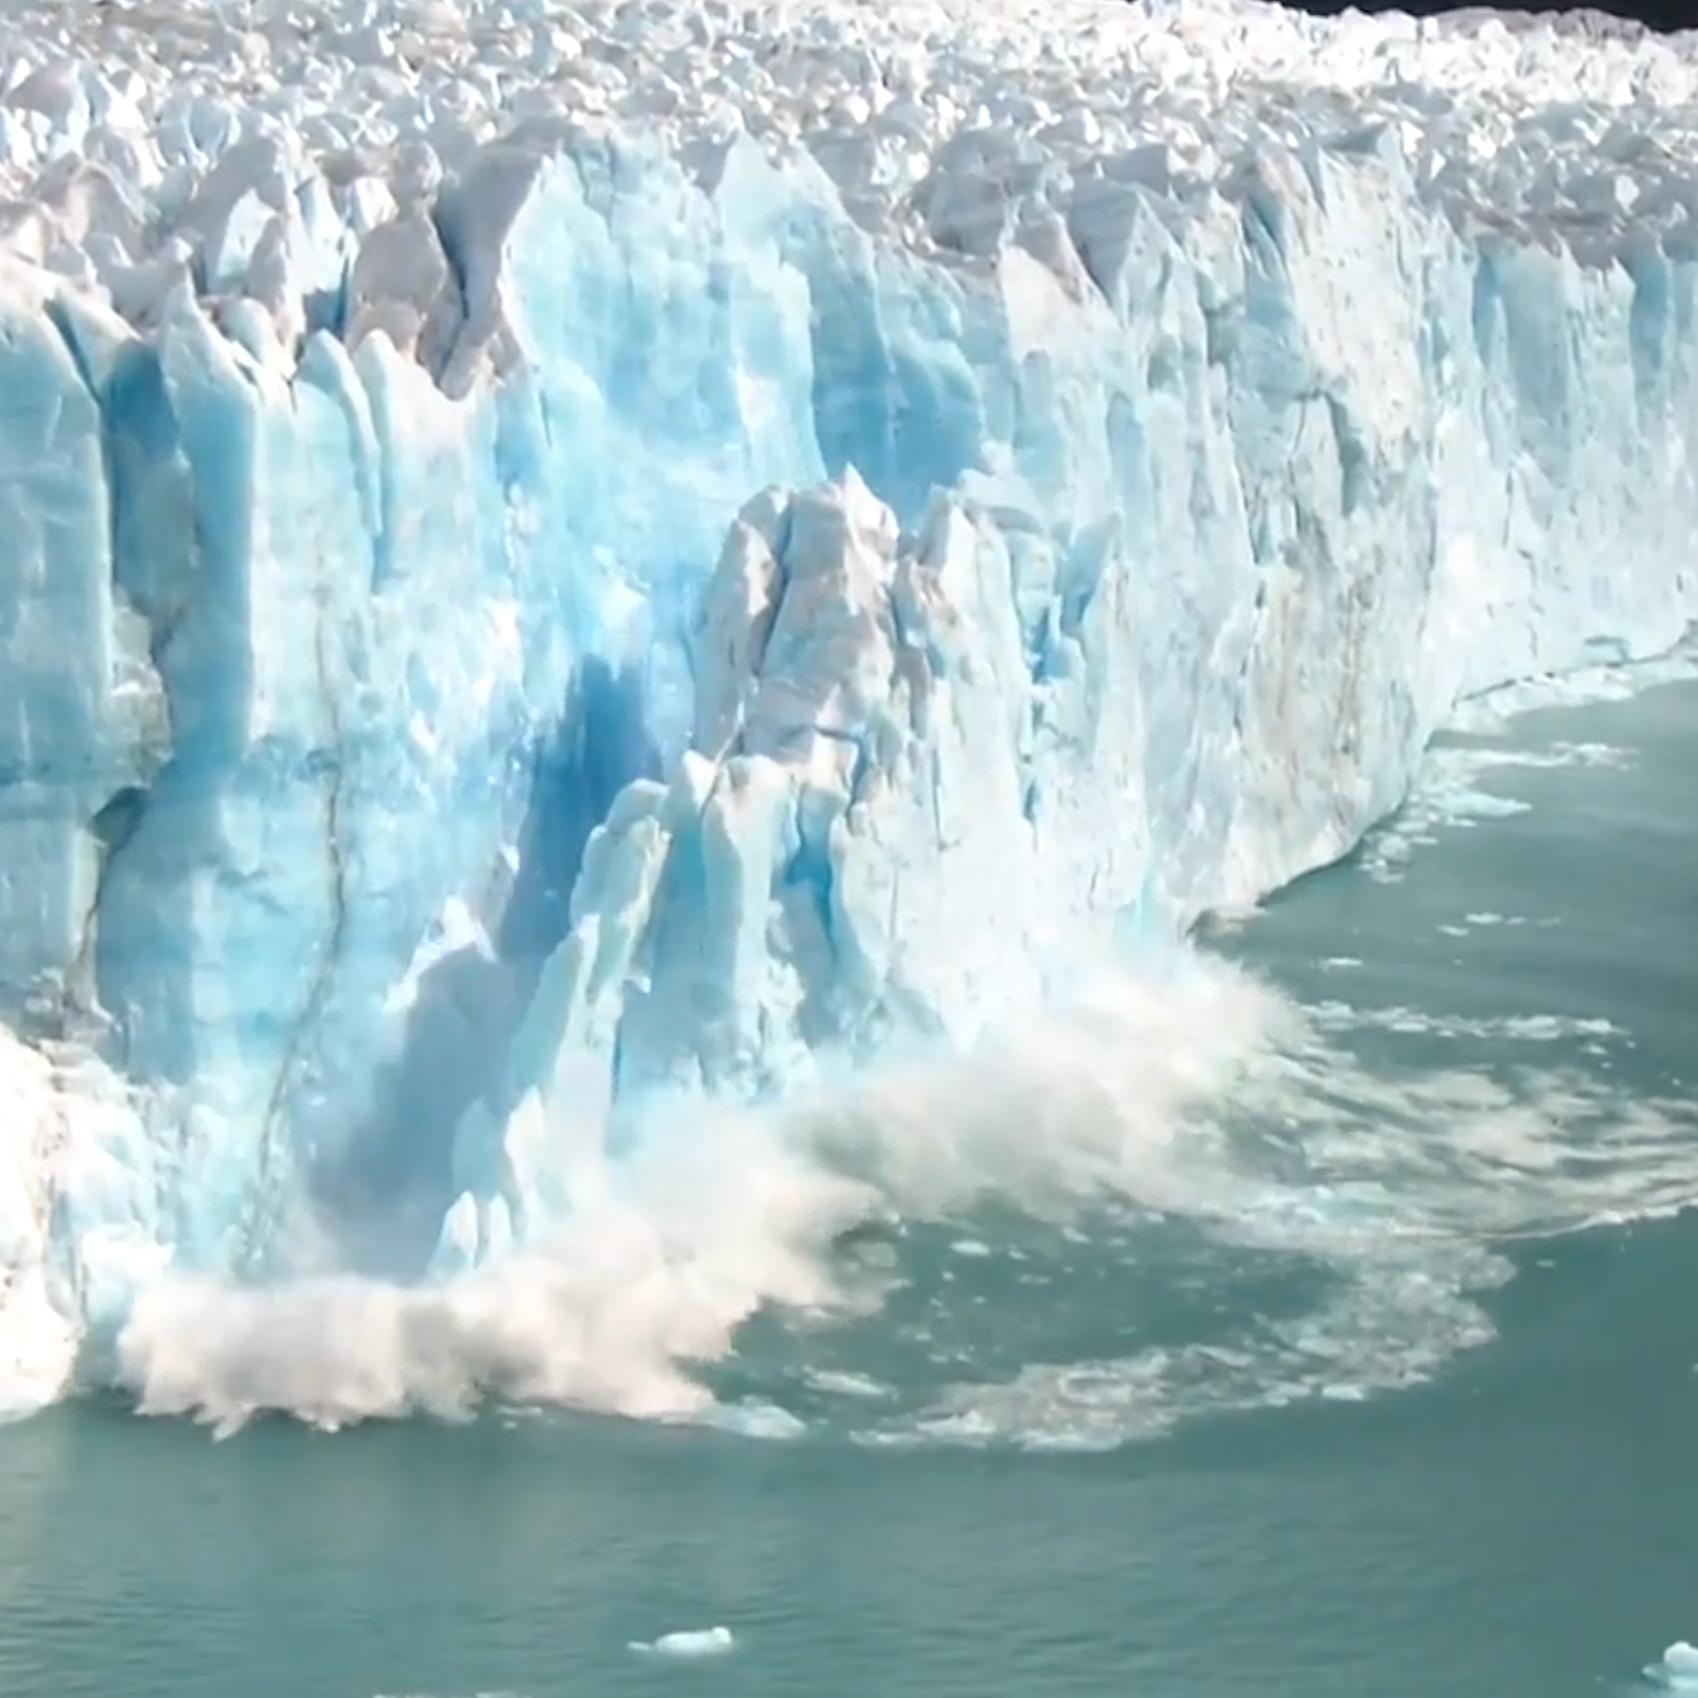 Demand Climate Action